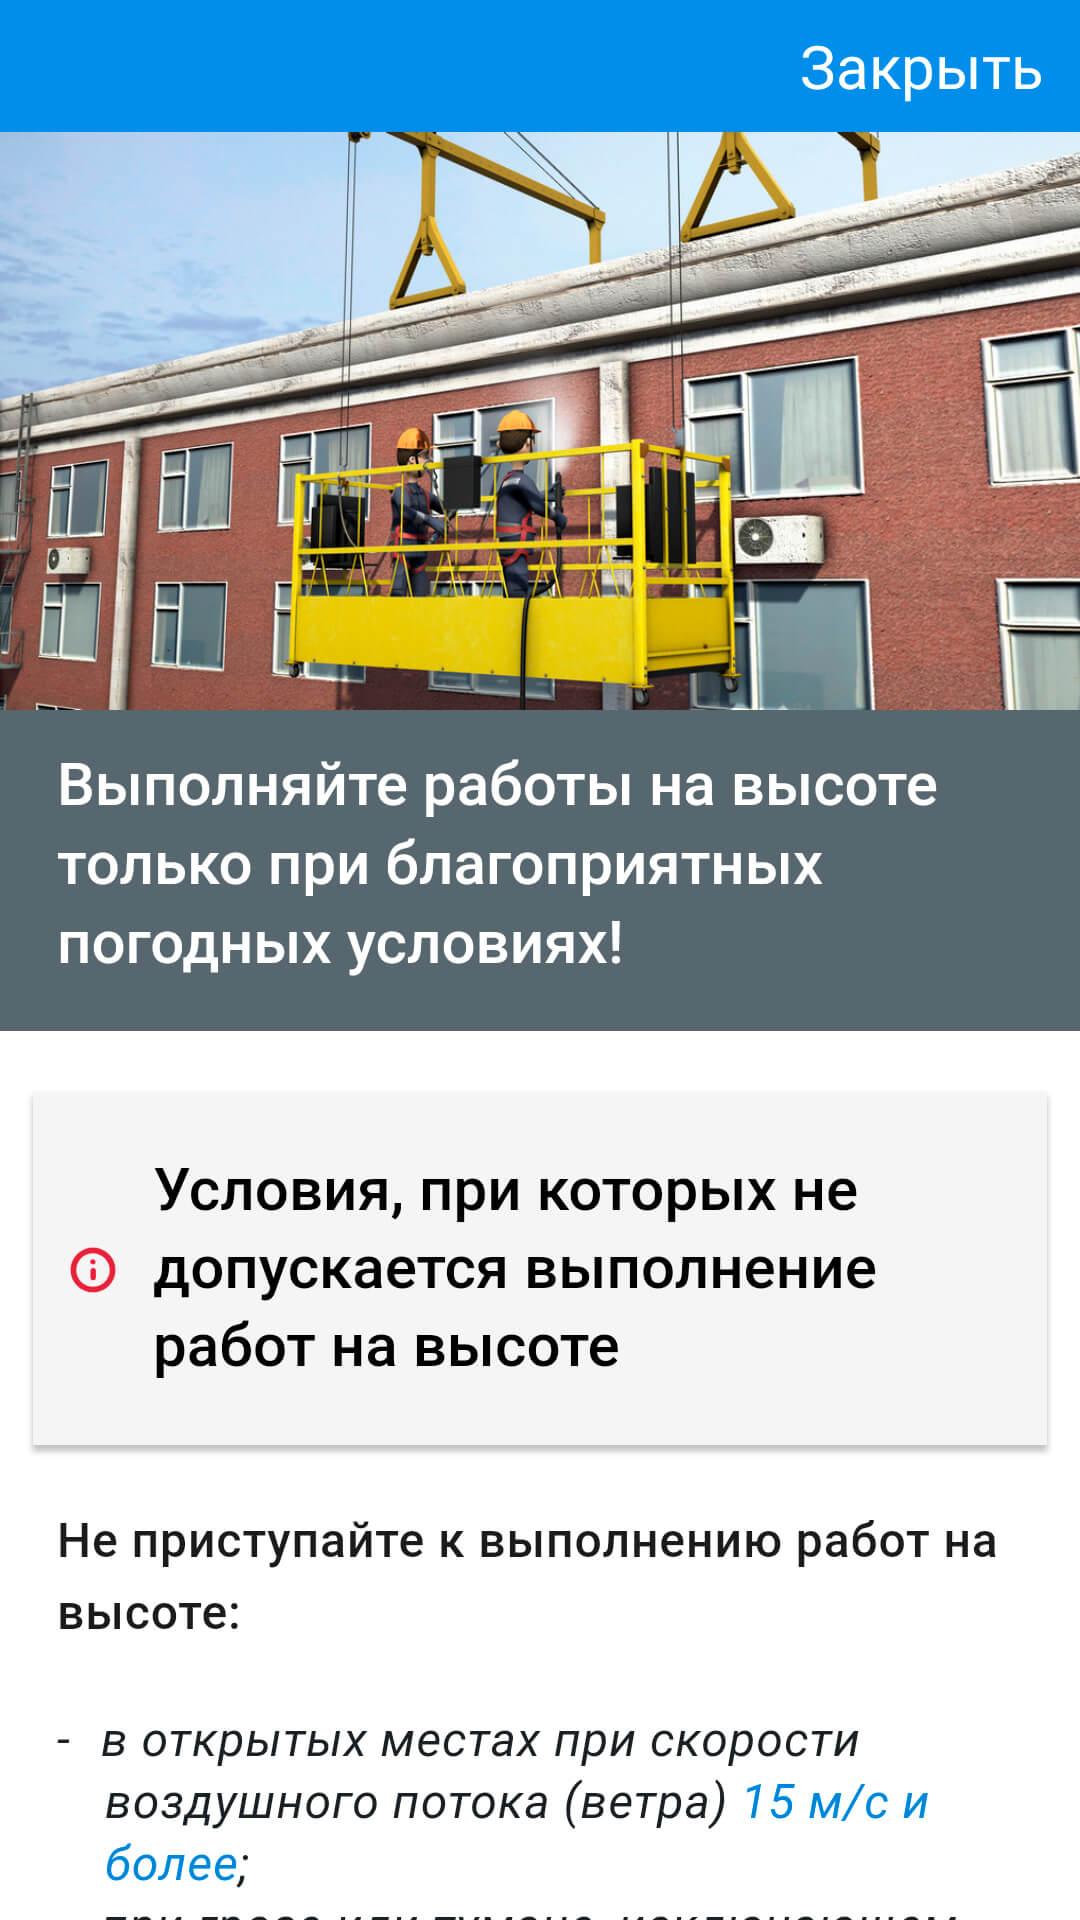 Обеспечение безопасности при работе на высоте - OT_201.5